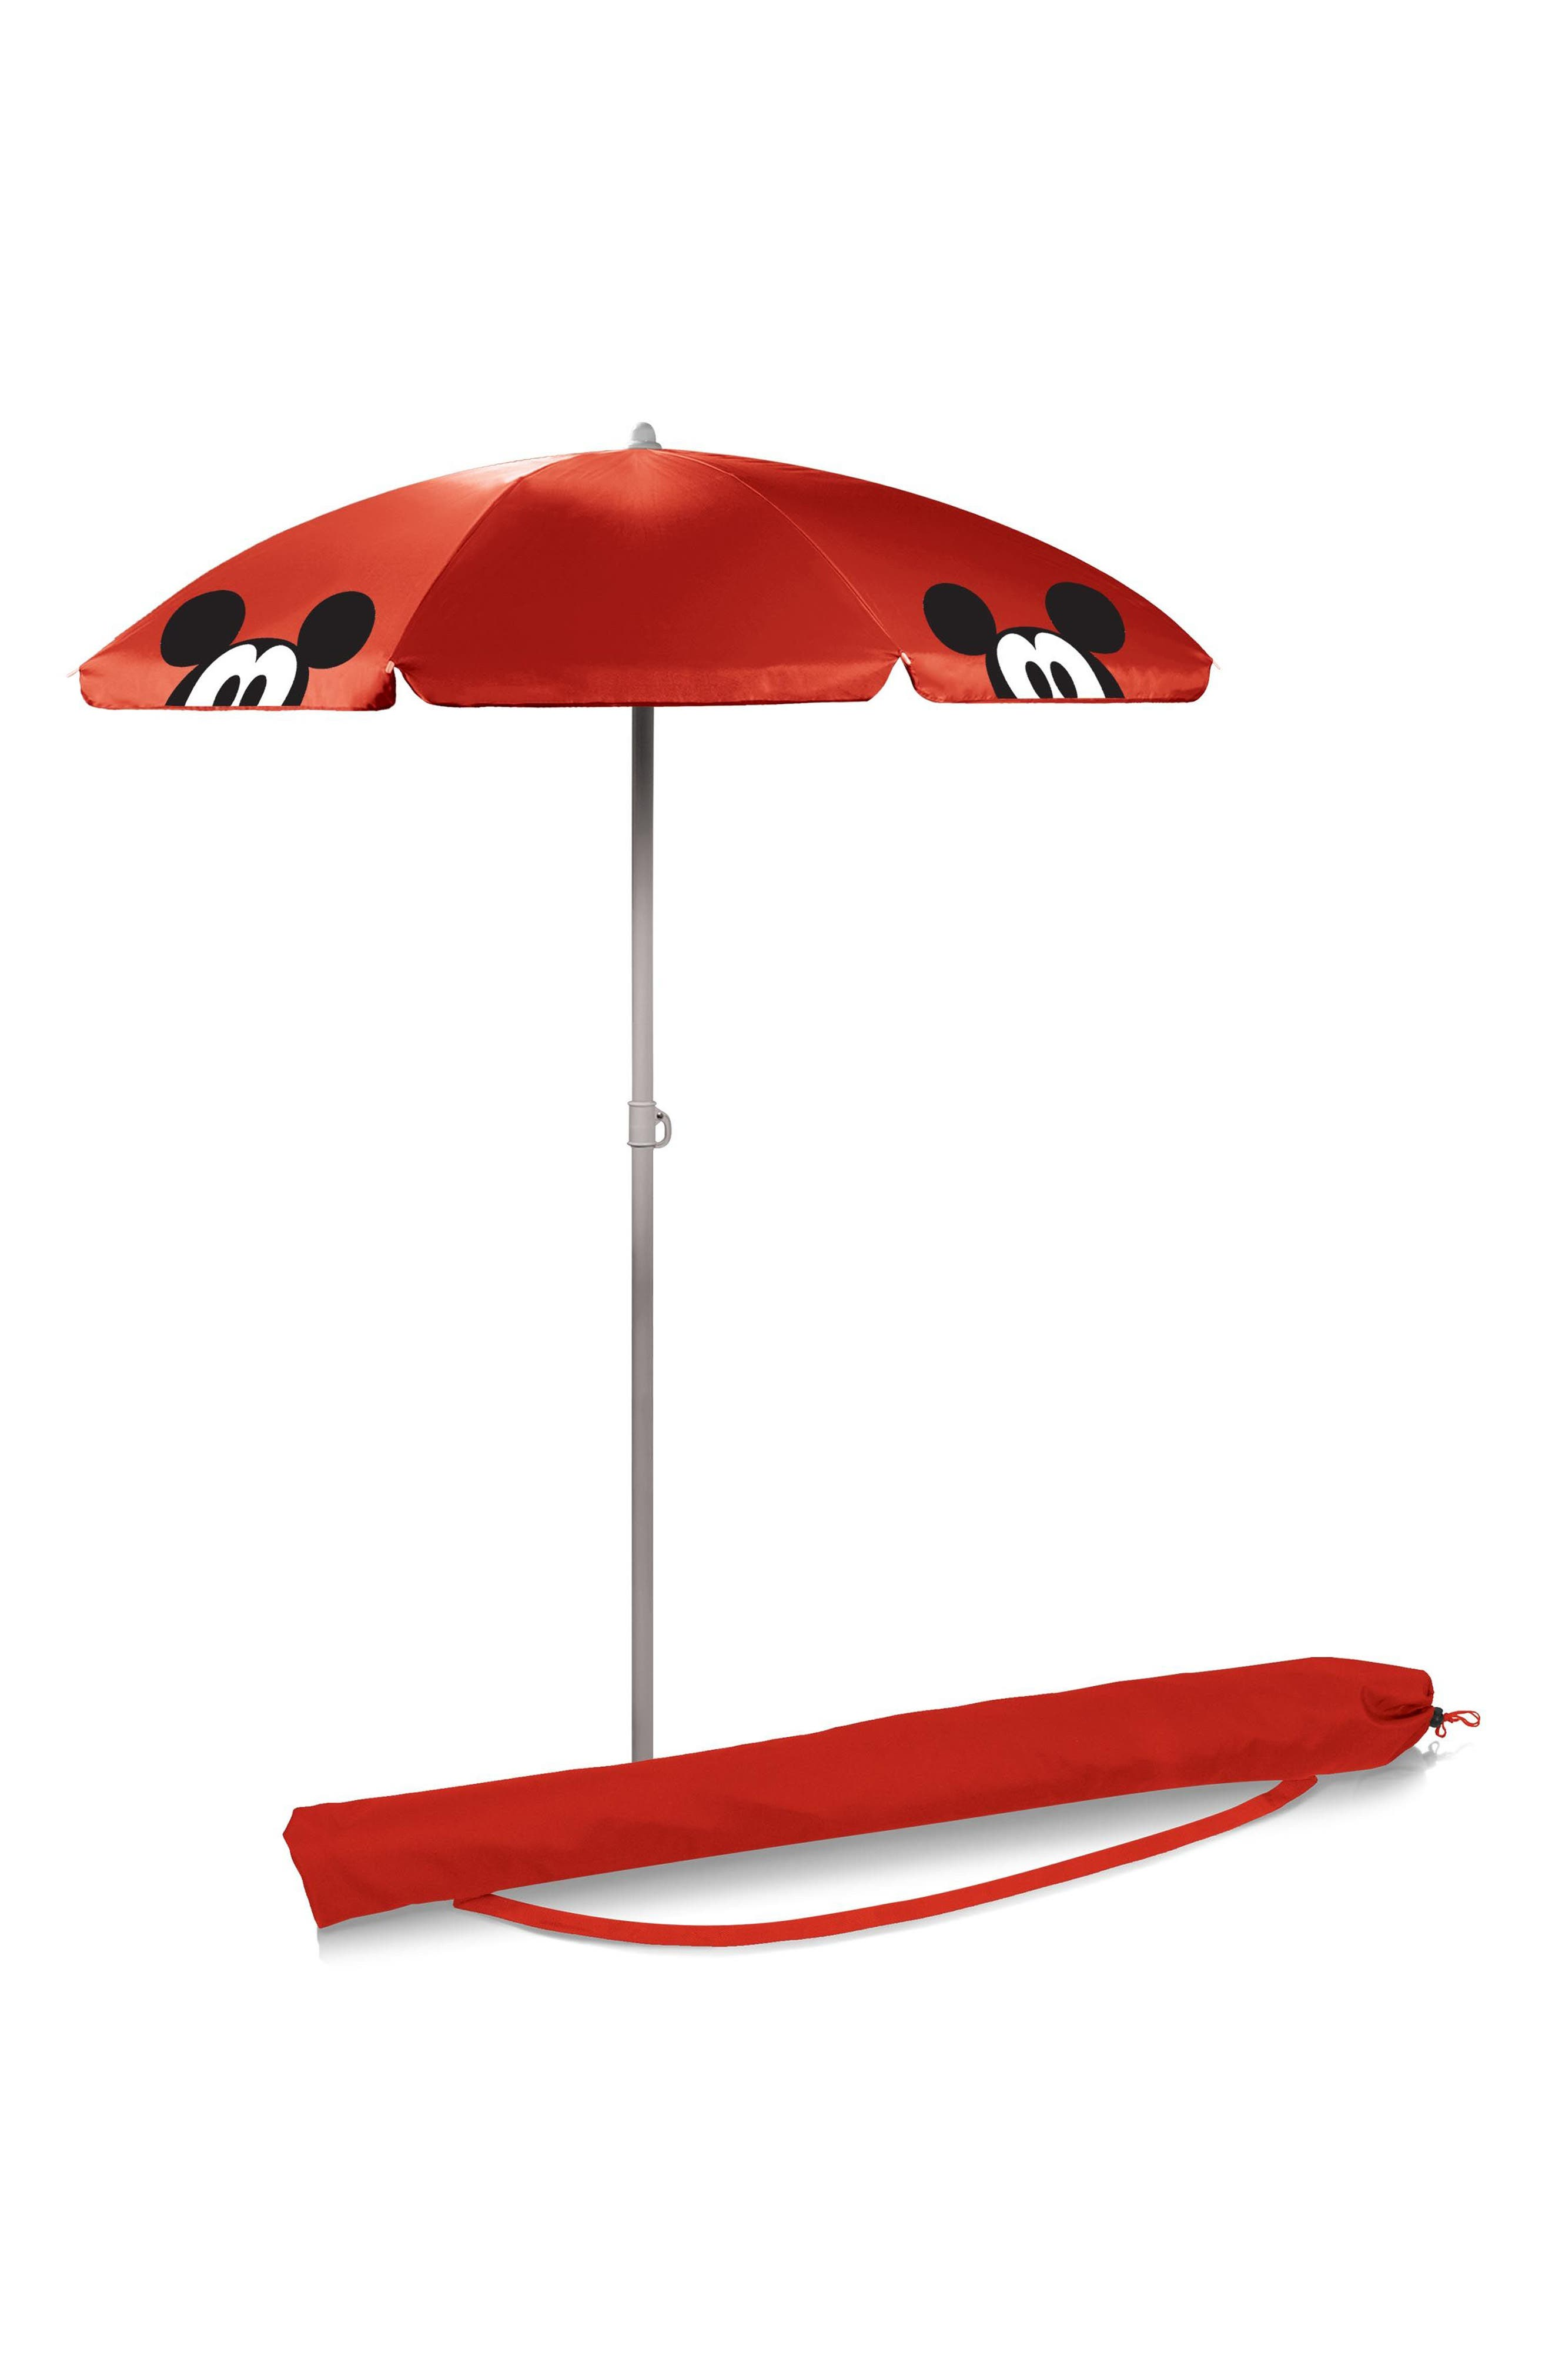 Disney<sup>®</sup> Mickey Mouse Portable Beach & Picnic Umbrella,                             Alternate thumbnail 2, color,                             600